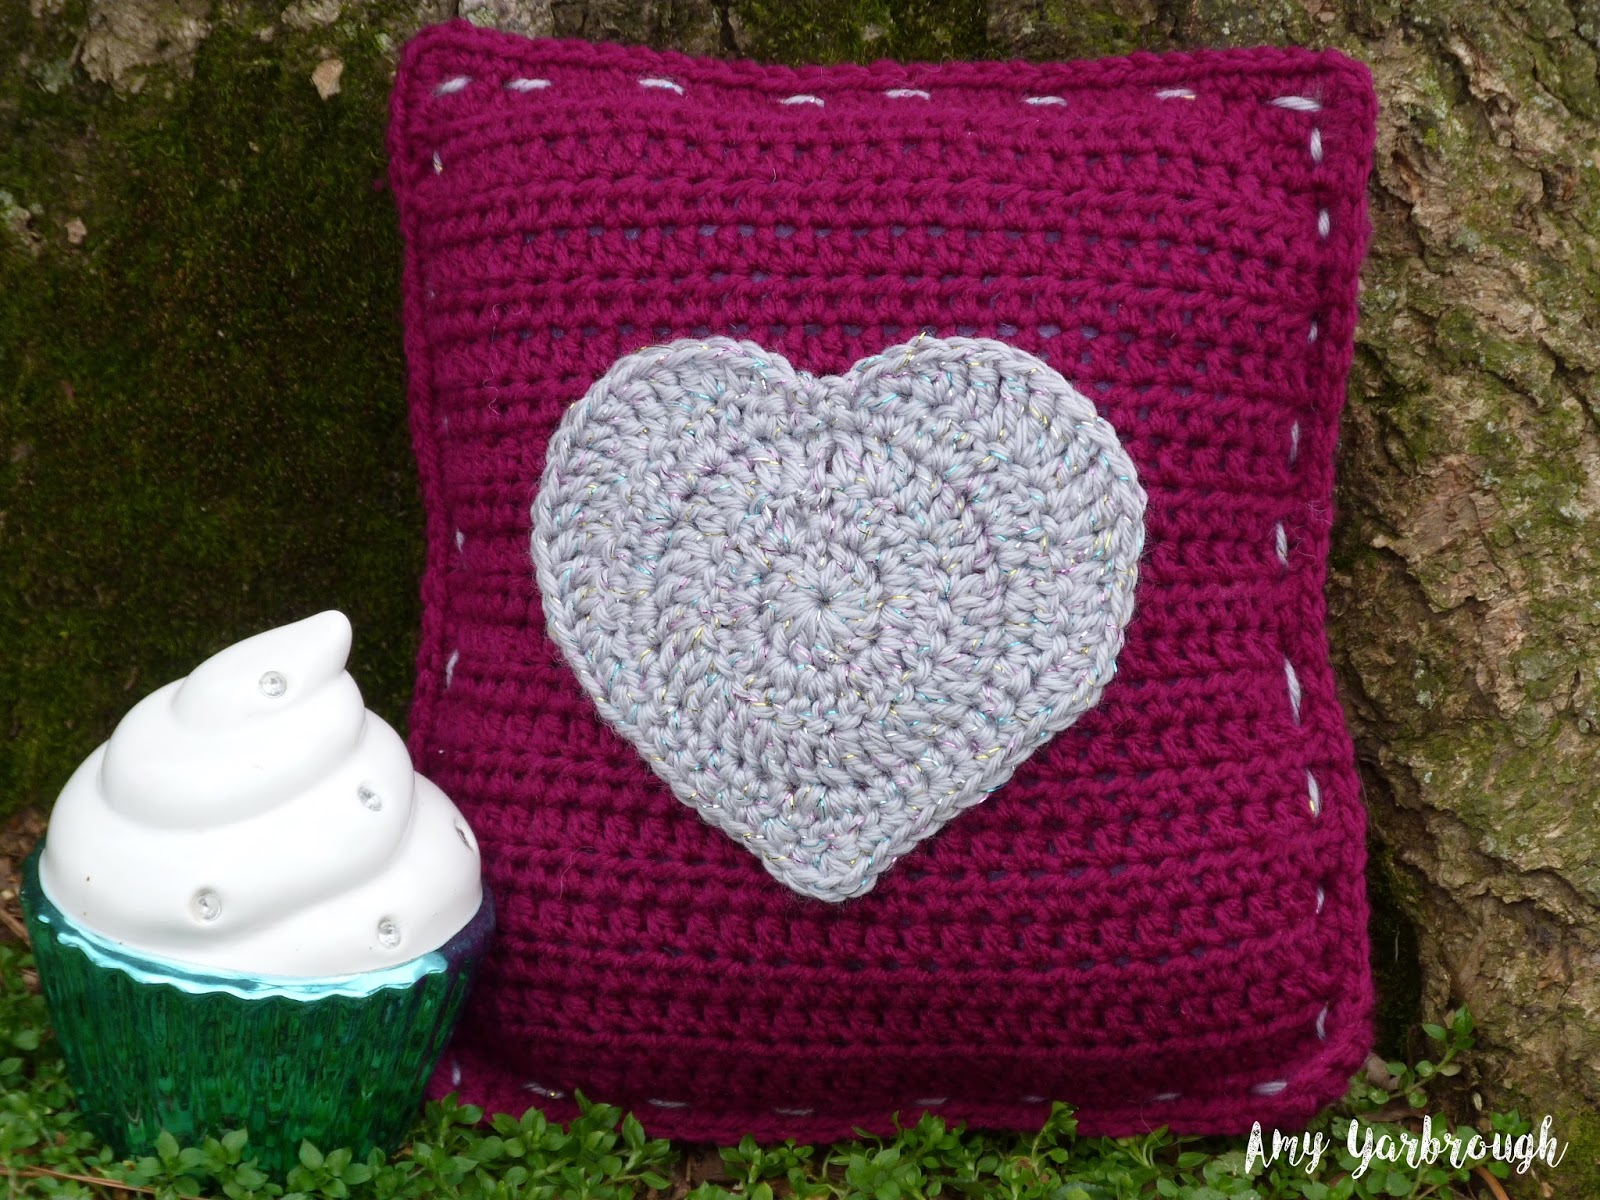 Glitzy Heart Mini Pillow New Crochet Pattern Ginger Peachy